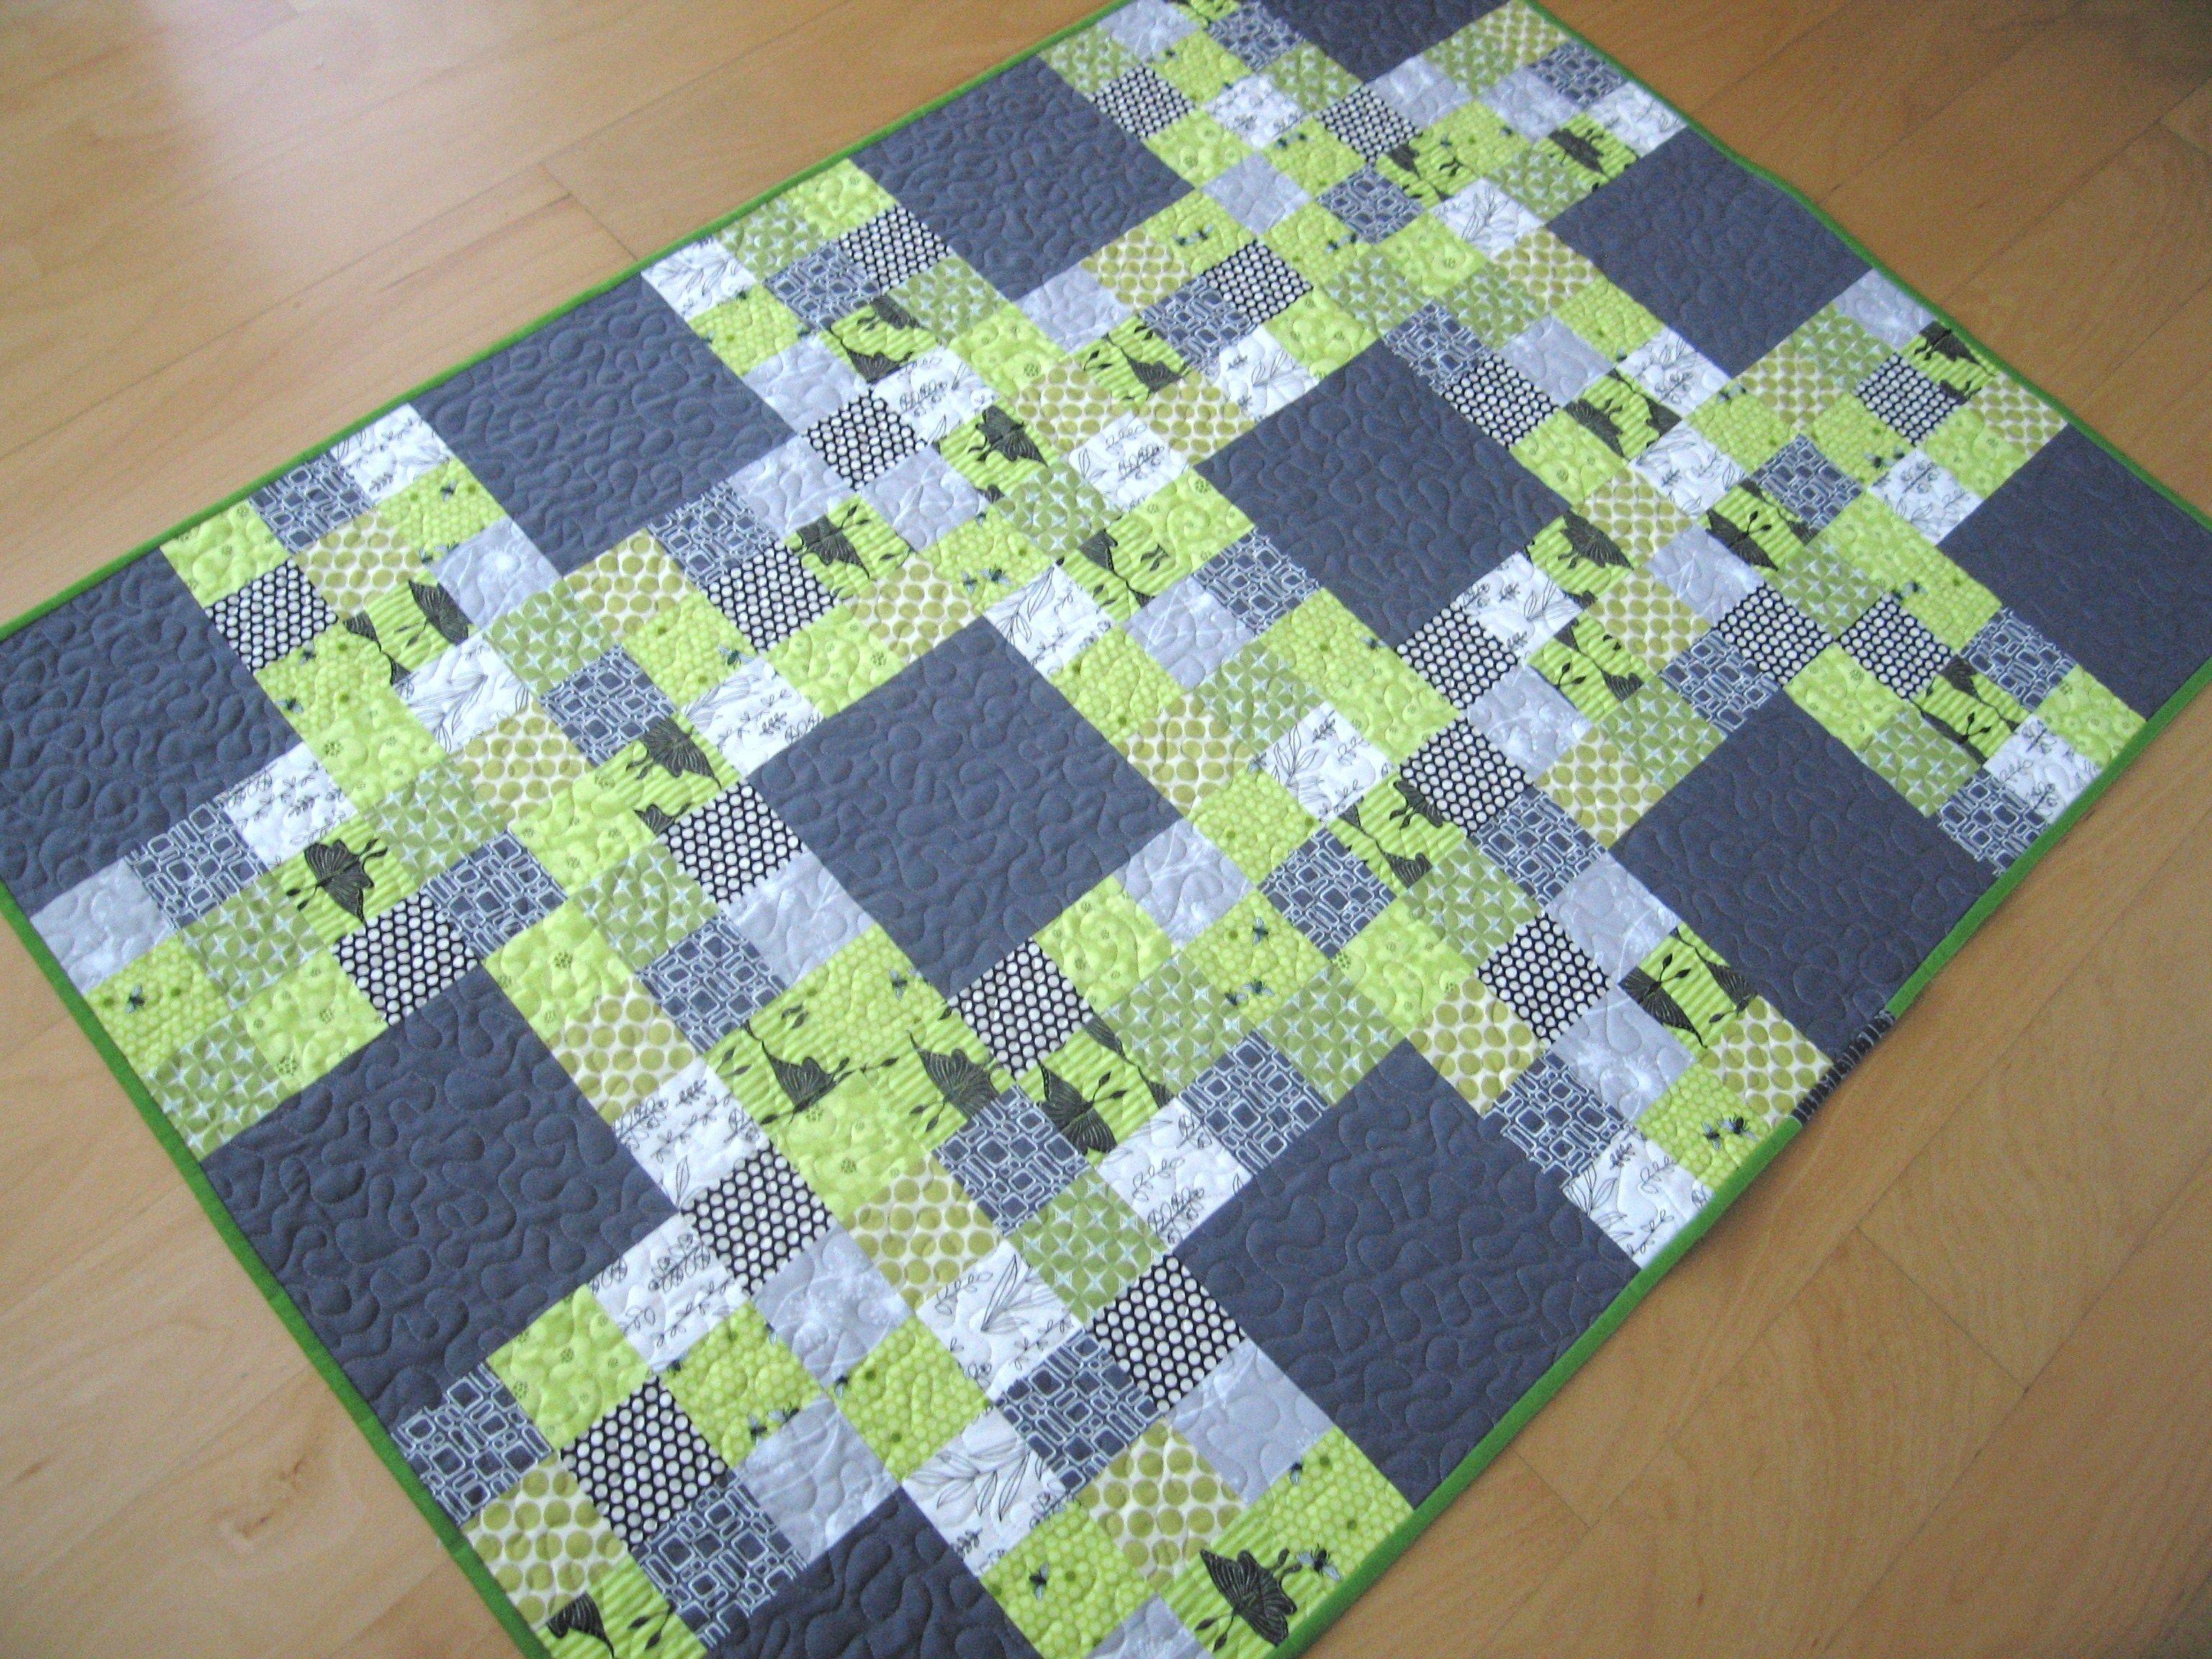 Process: Nine-Patch Lattice Quilt | Lattice quilt, Patches and ... : 9 patch baby quilt pattern - Adamdwight.com